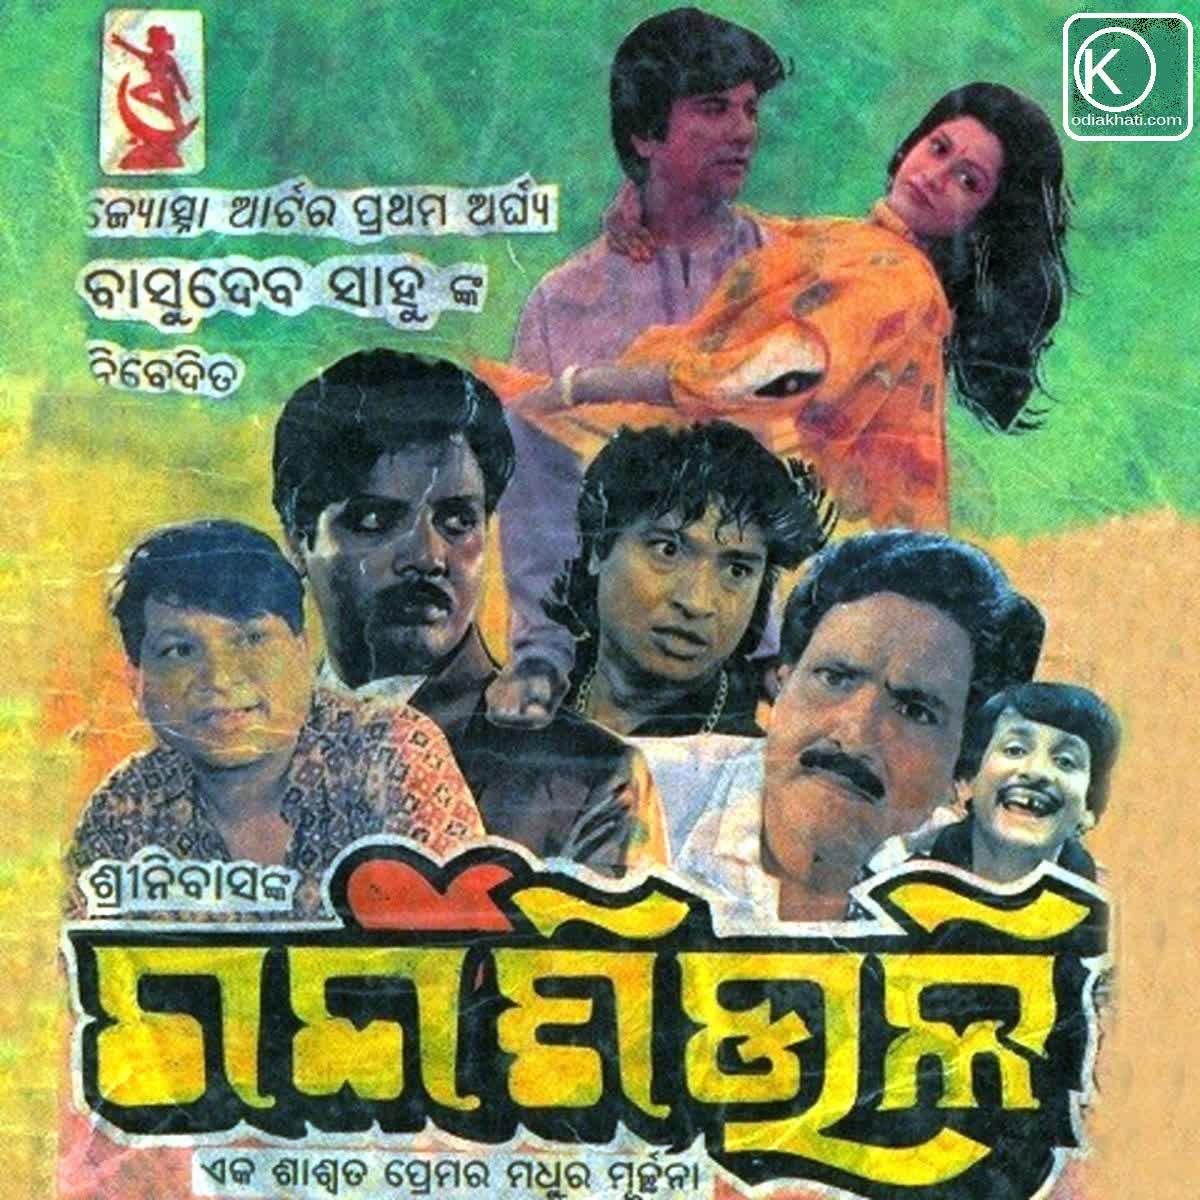 Sathi Tume Mane Ranga Dela Makhi (Suarabh Nayak, Lopita Mishra)